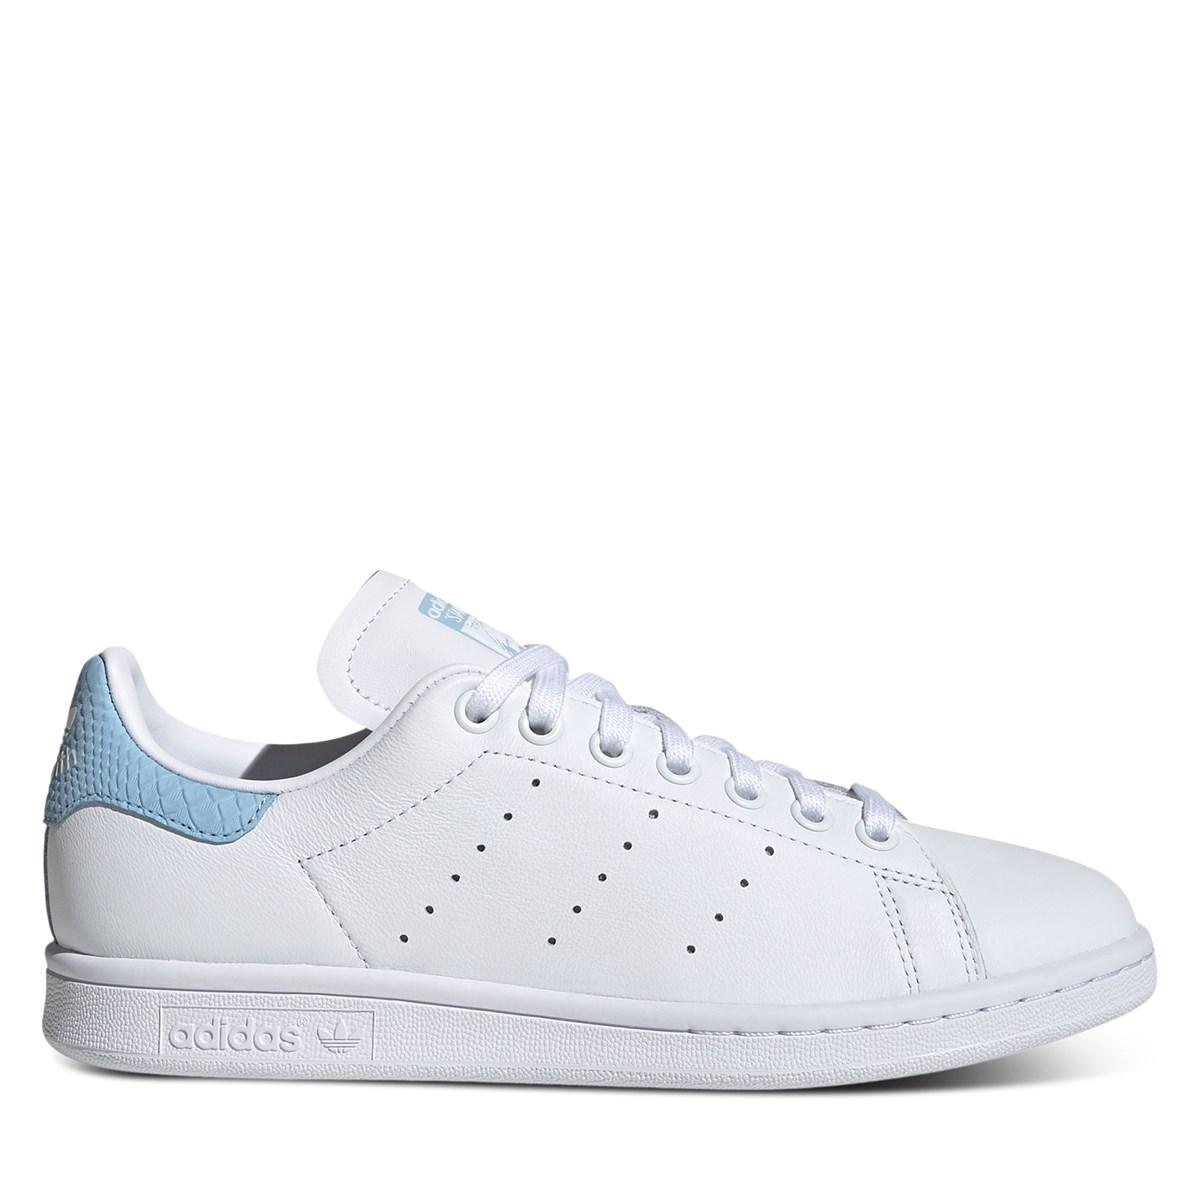 Women's Stan Smith Sneakers in White